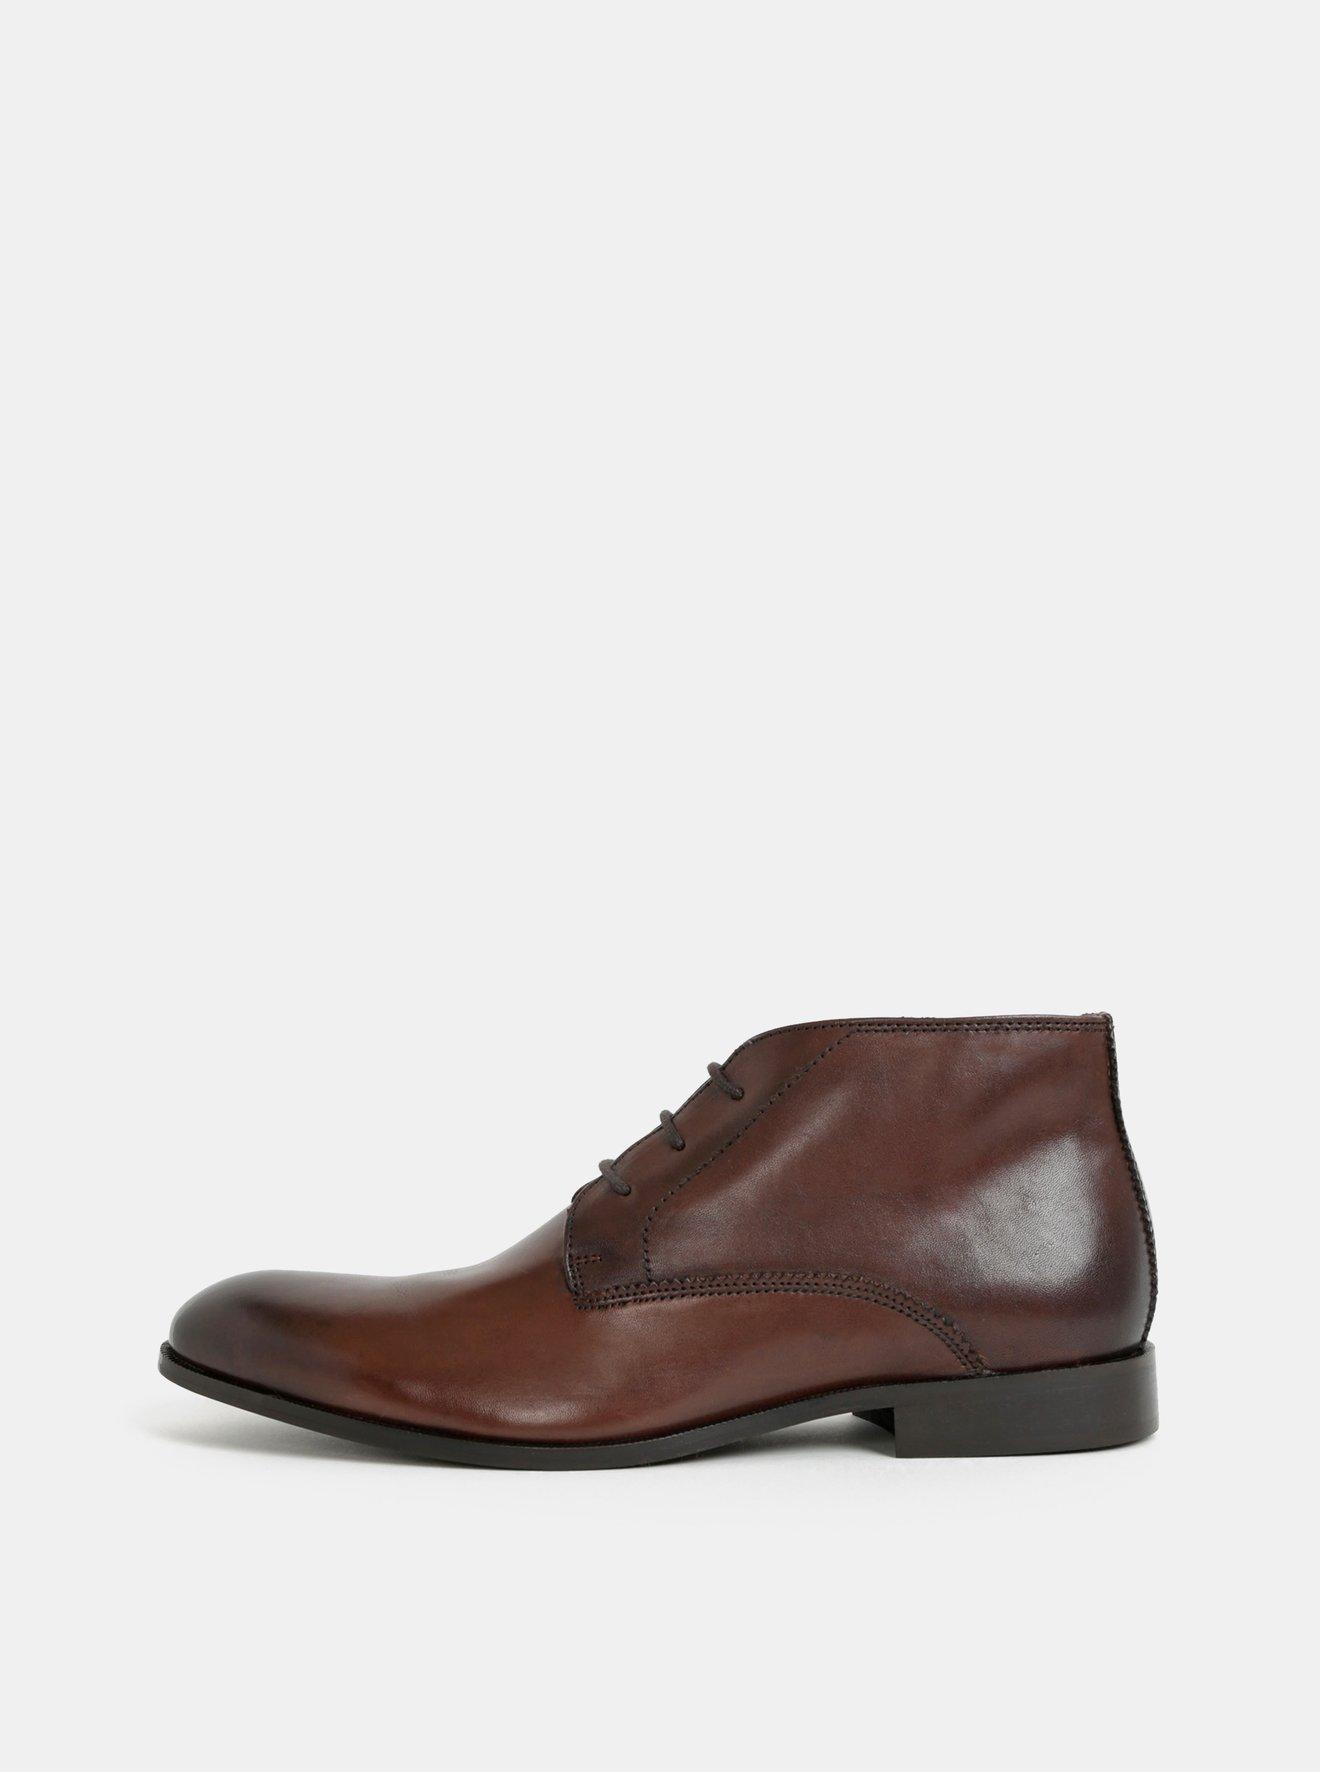 dc885afb87 Tmavohnedé pánske kožené členkové topánky Burton Menswear London.  Tmavohnedé pánske kožené členkové topánky Burton Menswear London